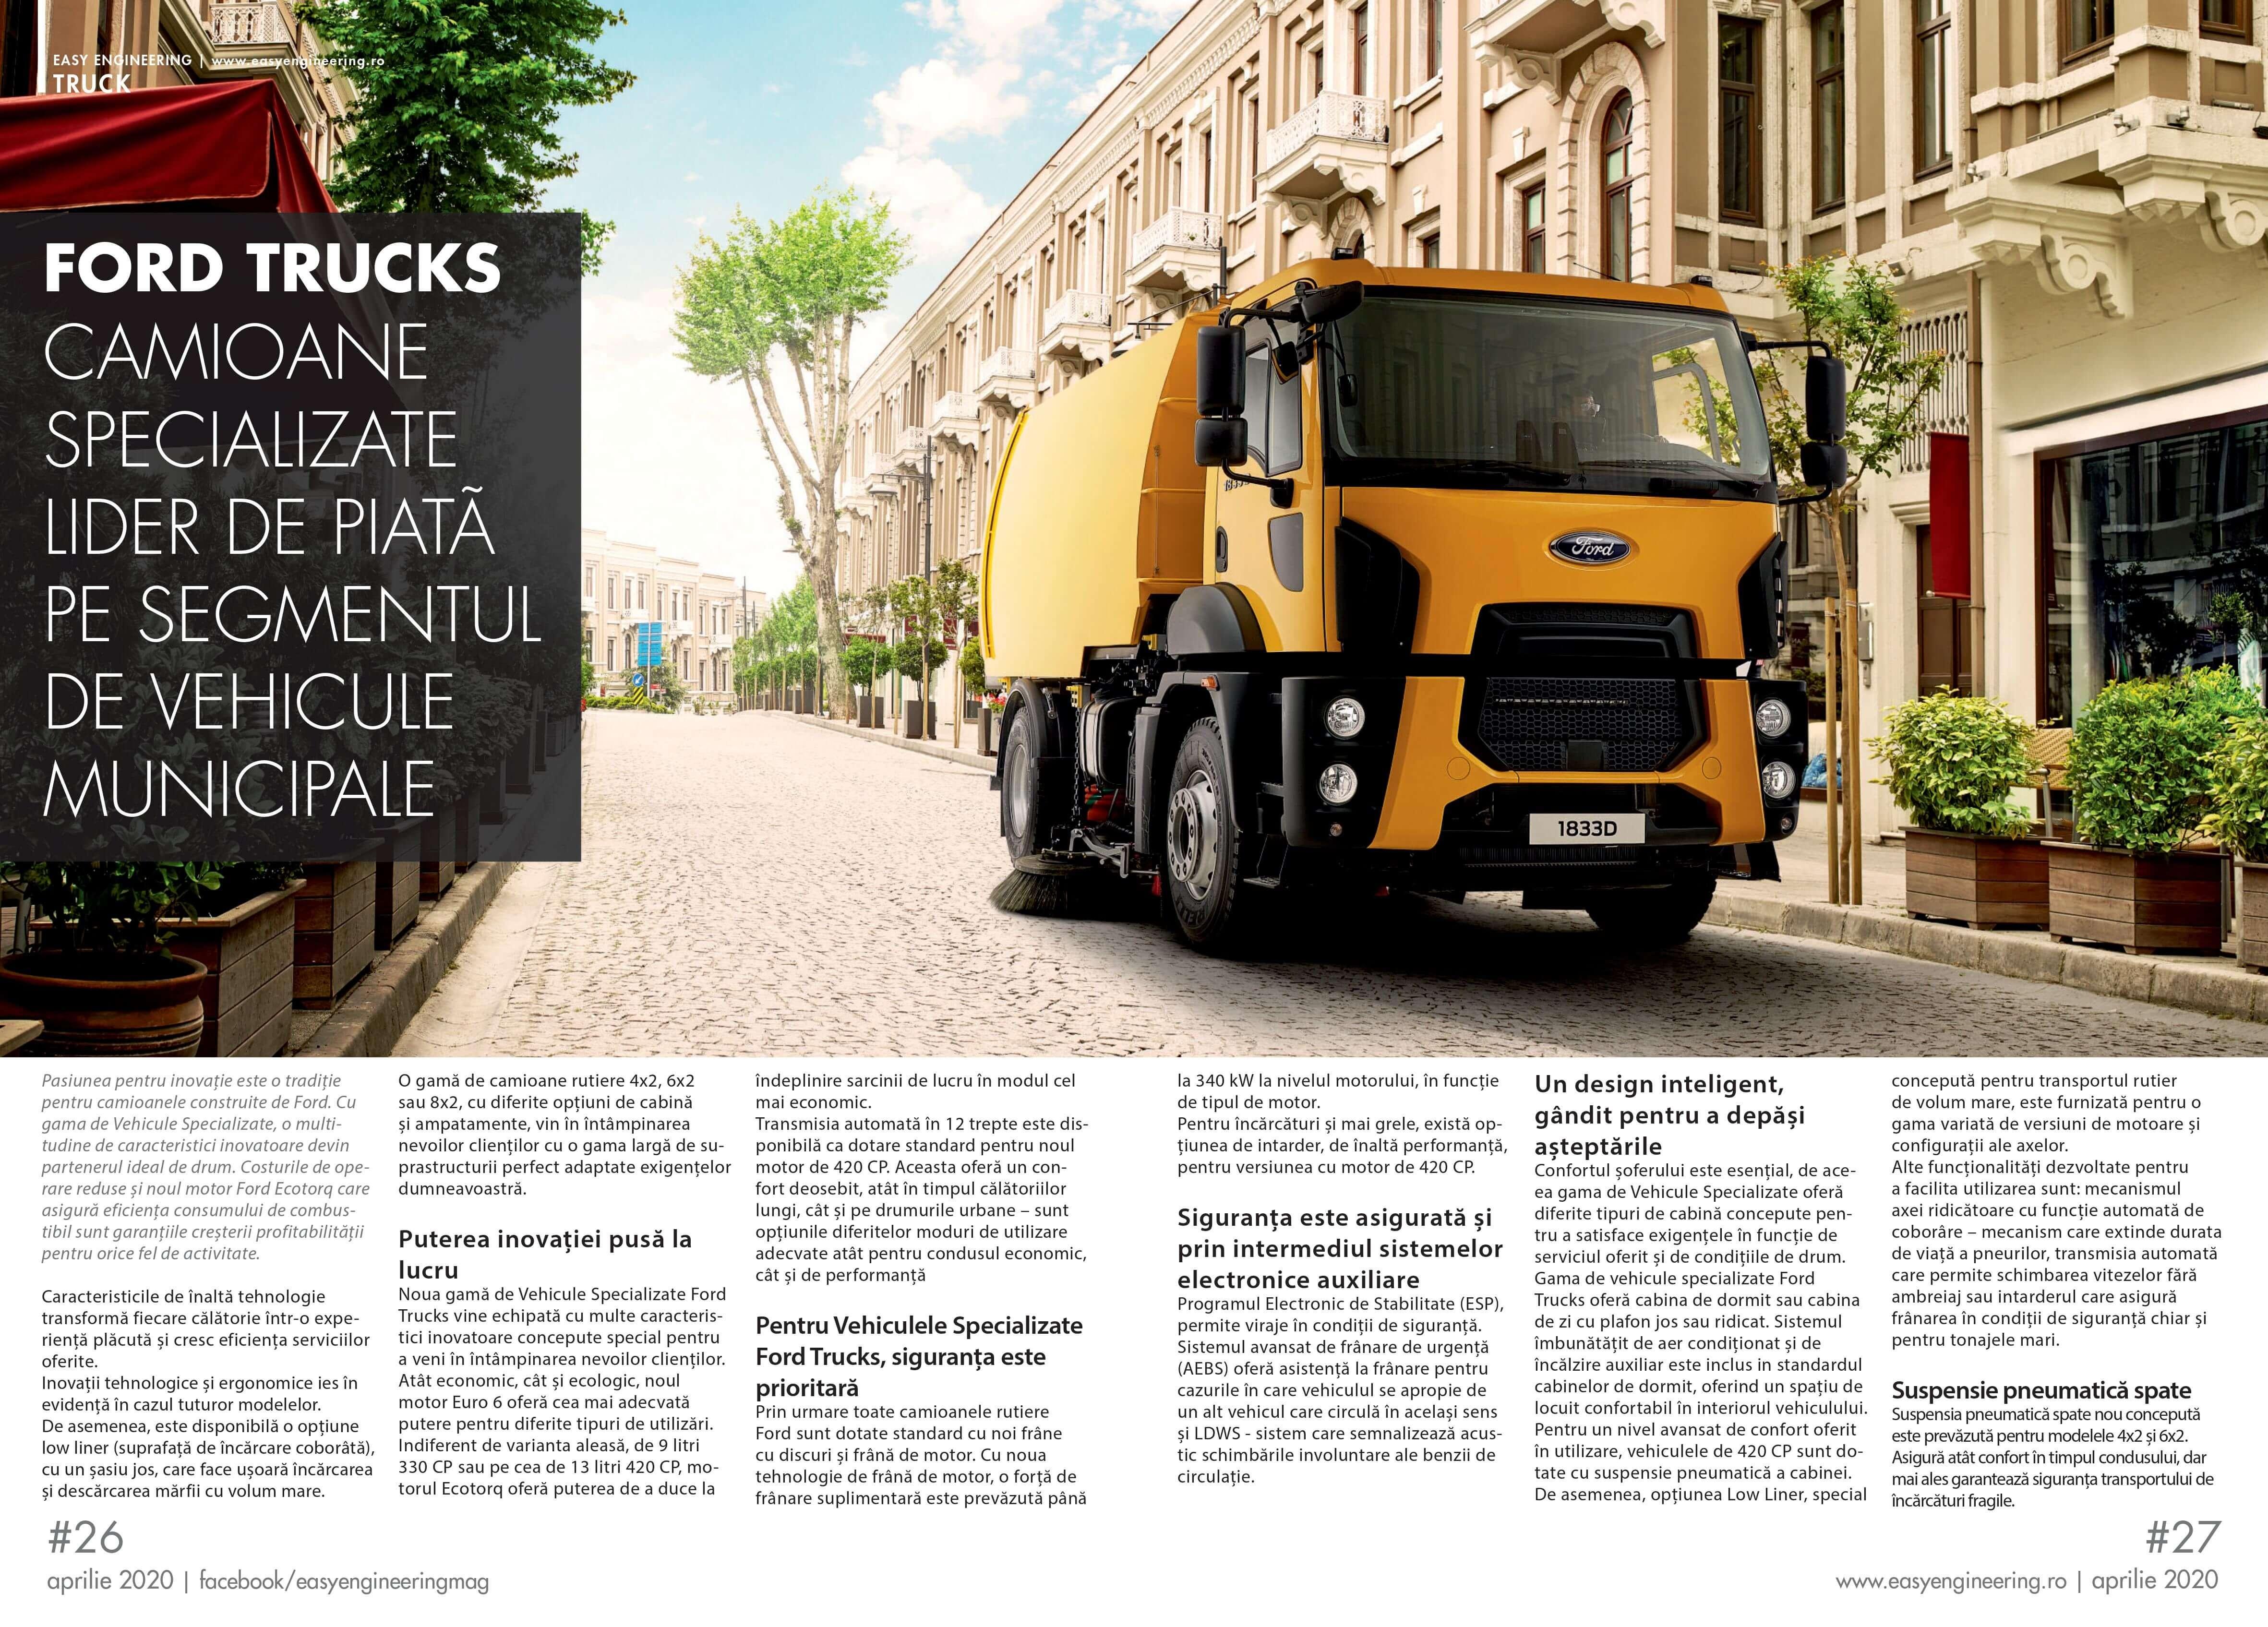 PRESA - EASY ENGINEERING -  Ford Trucks, camioane specializate, lider de piata pe segmentul de vehicule municipale